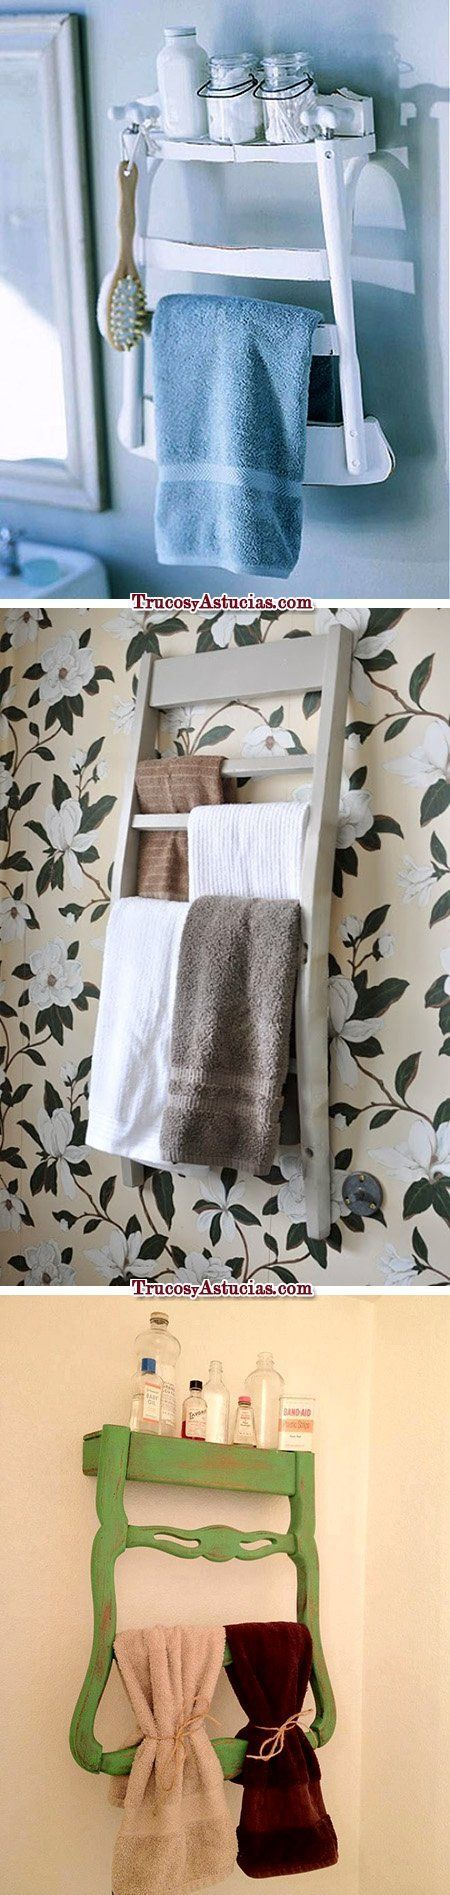 reciclar sillas: toalleros